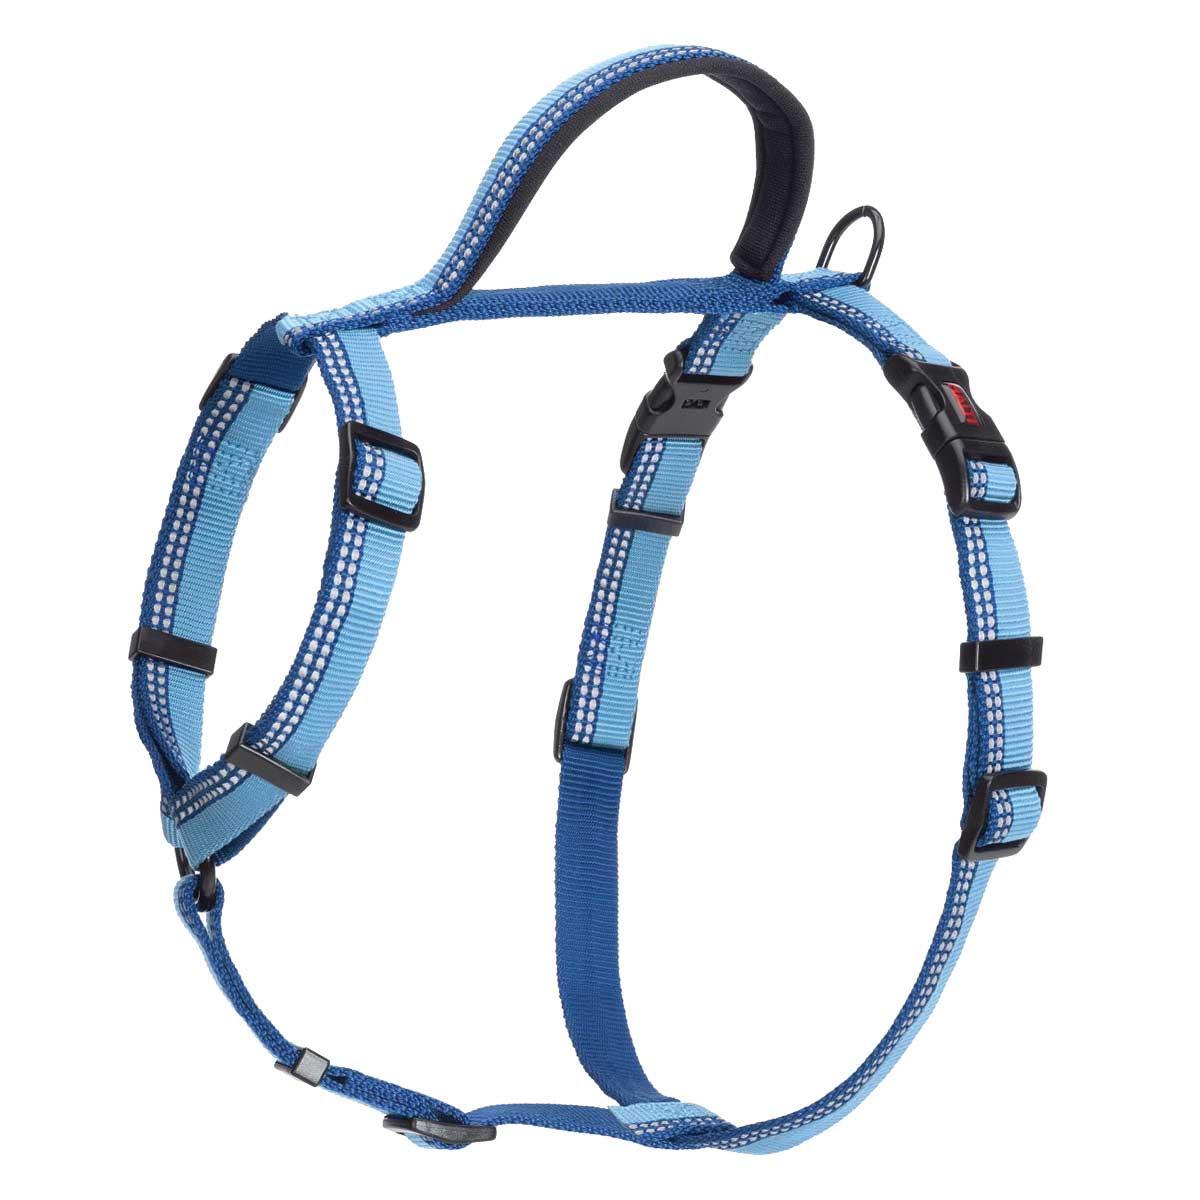 Halti Walking Harness Medium Blue 22 inches -30 inches